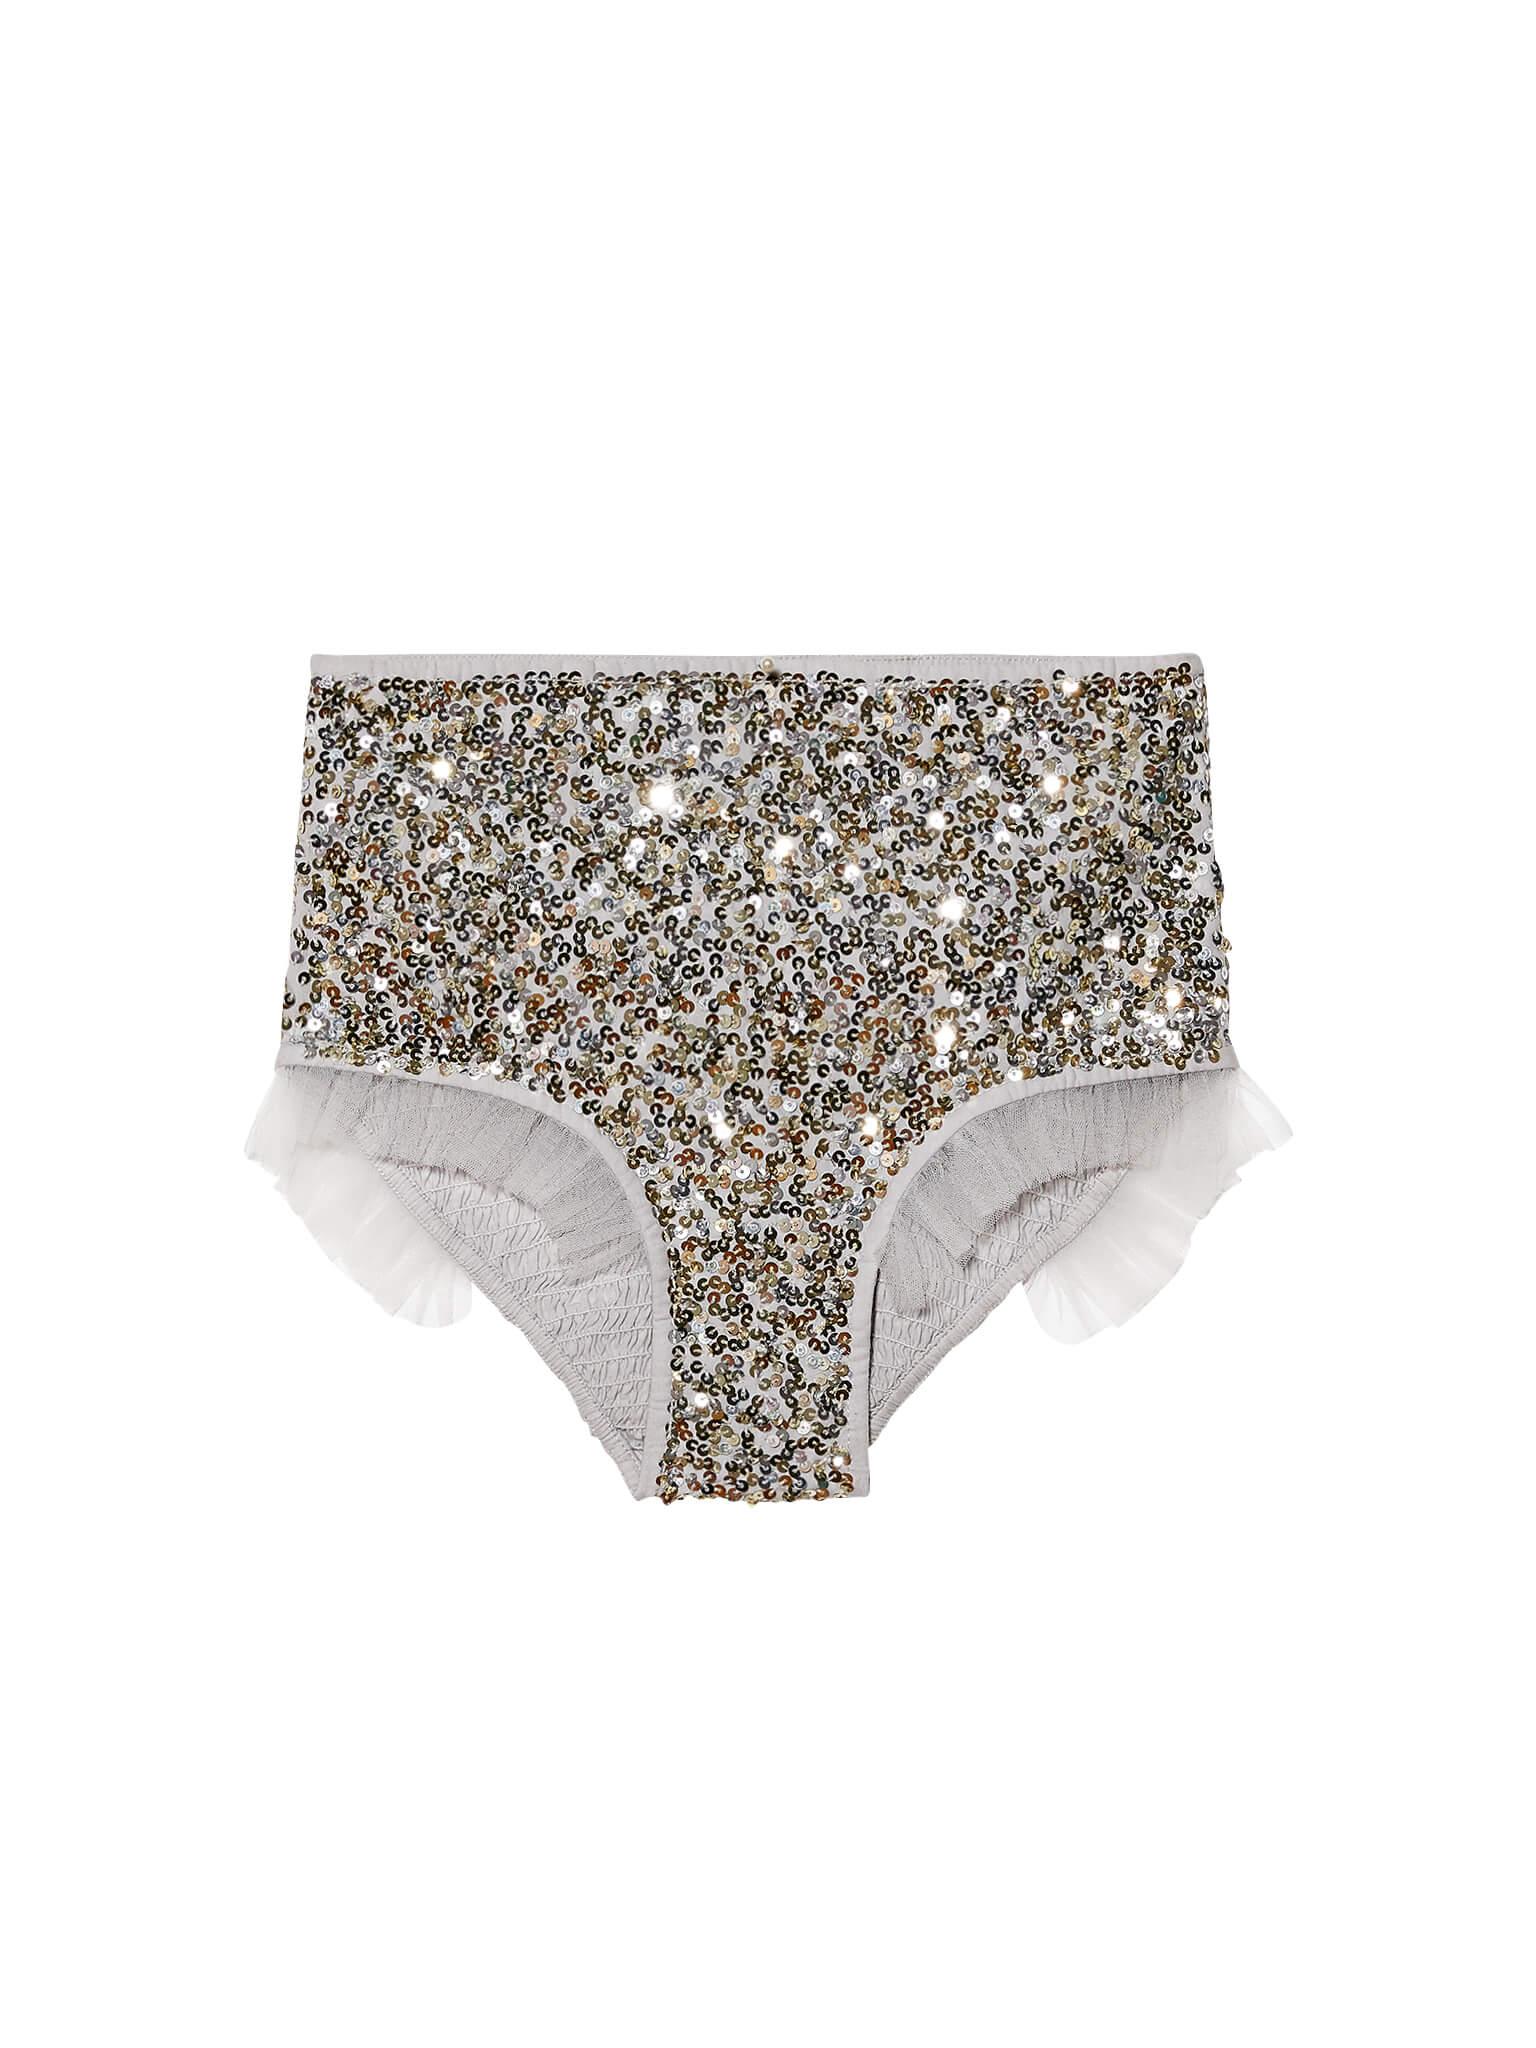 Tdm4325 showstopper shorts 01